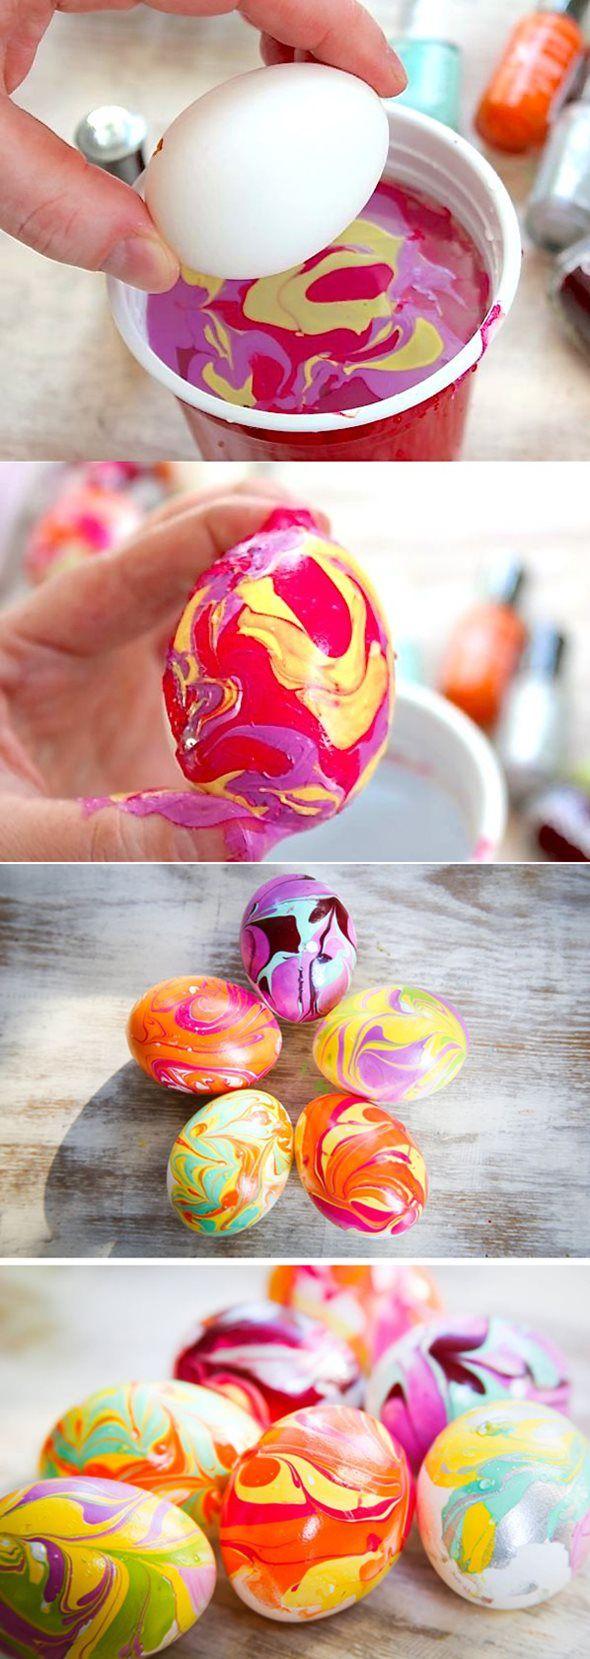 DIY Nail Polish Dipping Easter Eggs | Huevos pintados, Huevo y Esmalte